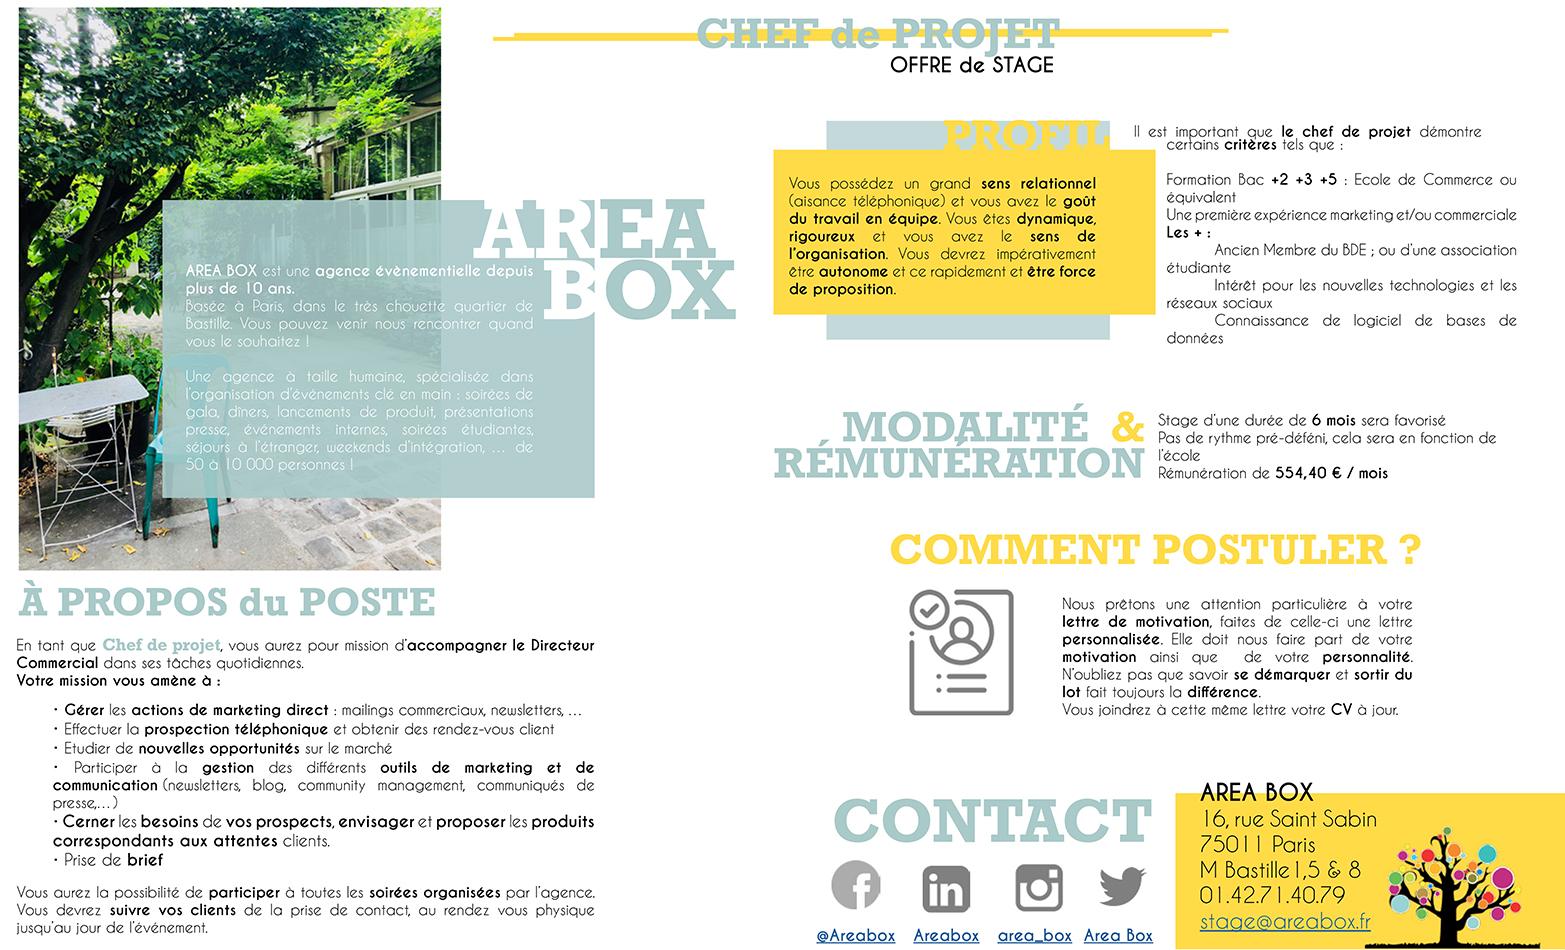 Chef De Projet Area Box Agence Evenementielle